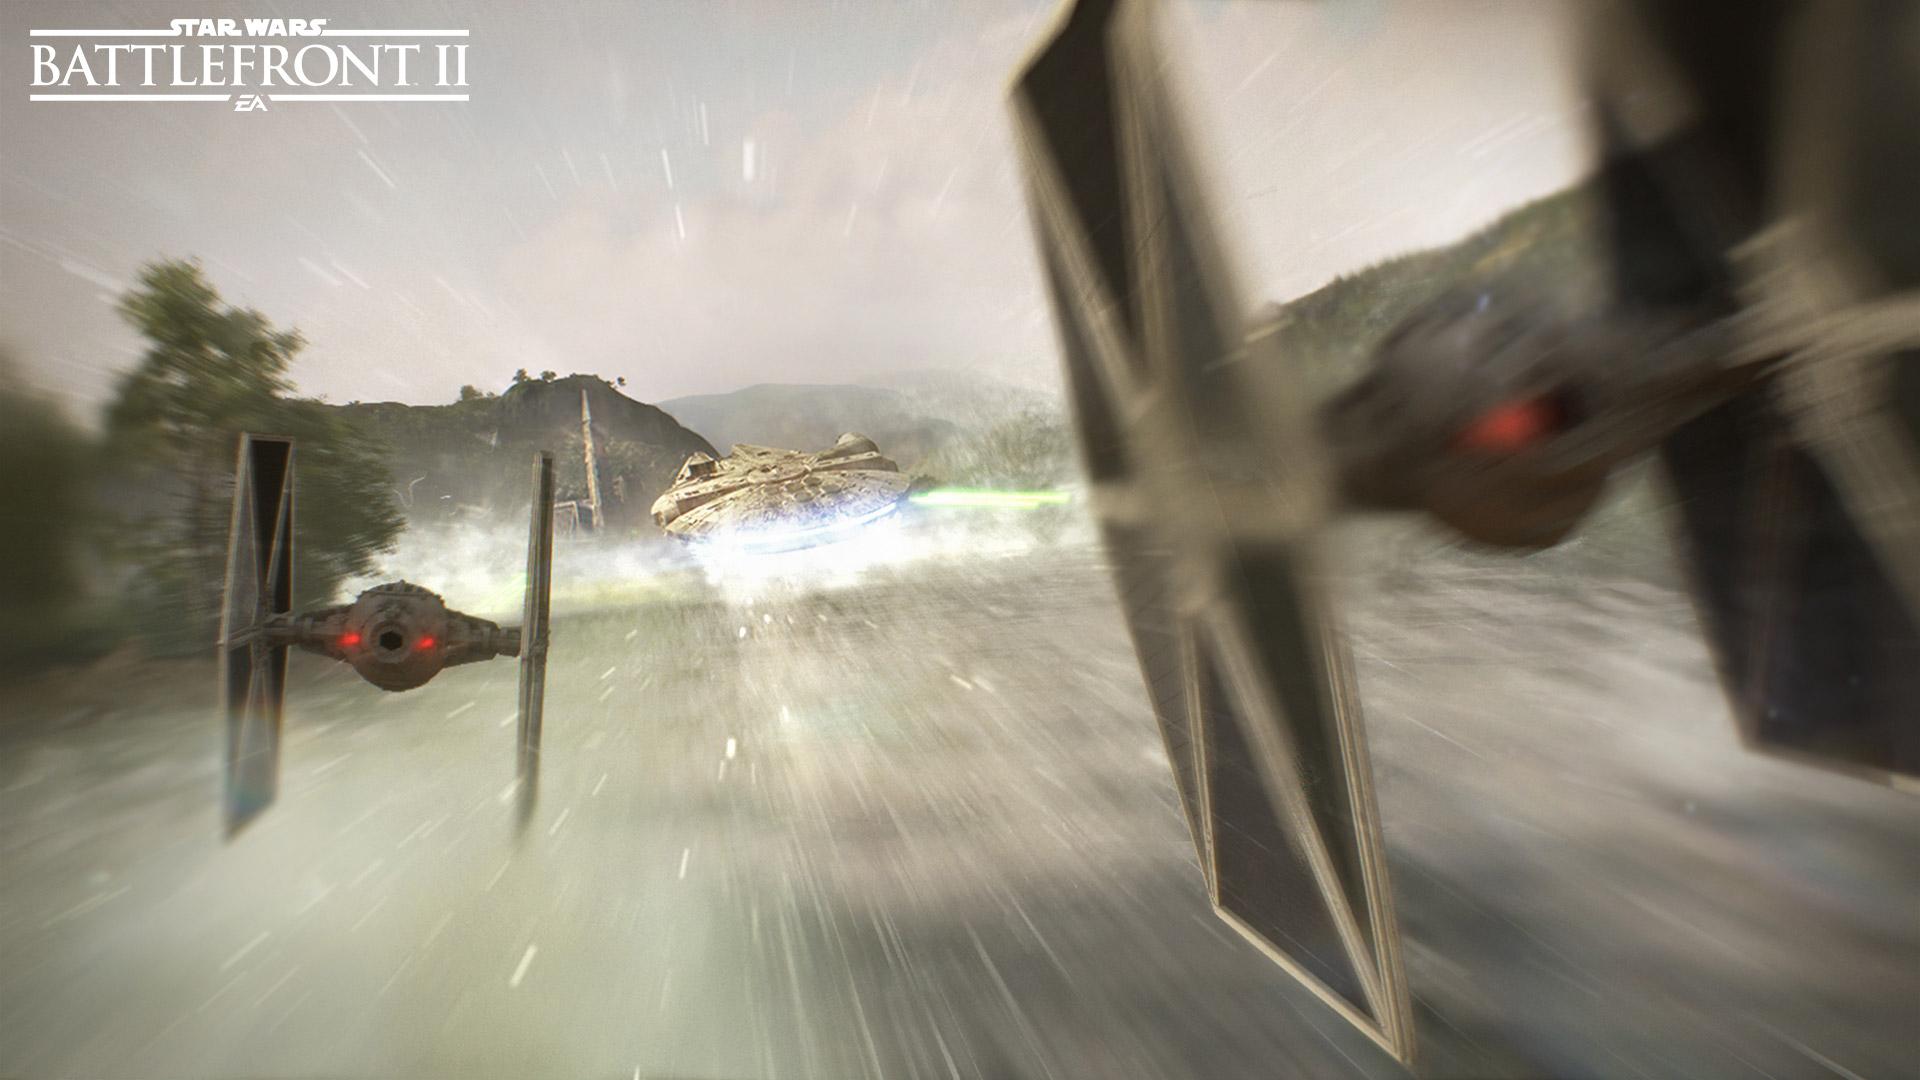 Star Wars Battlefront 2 Background 23